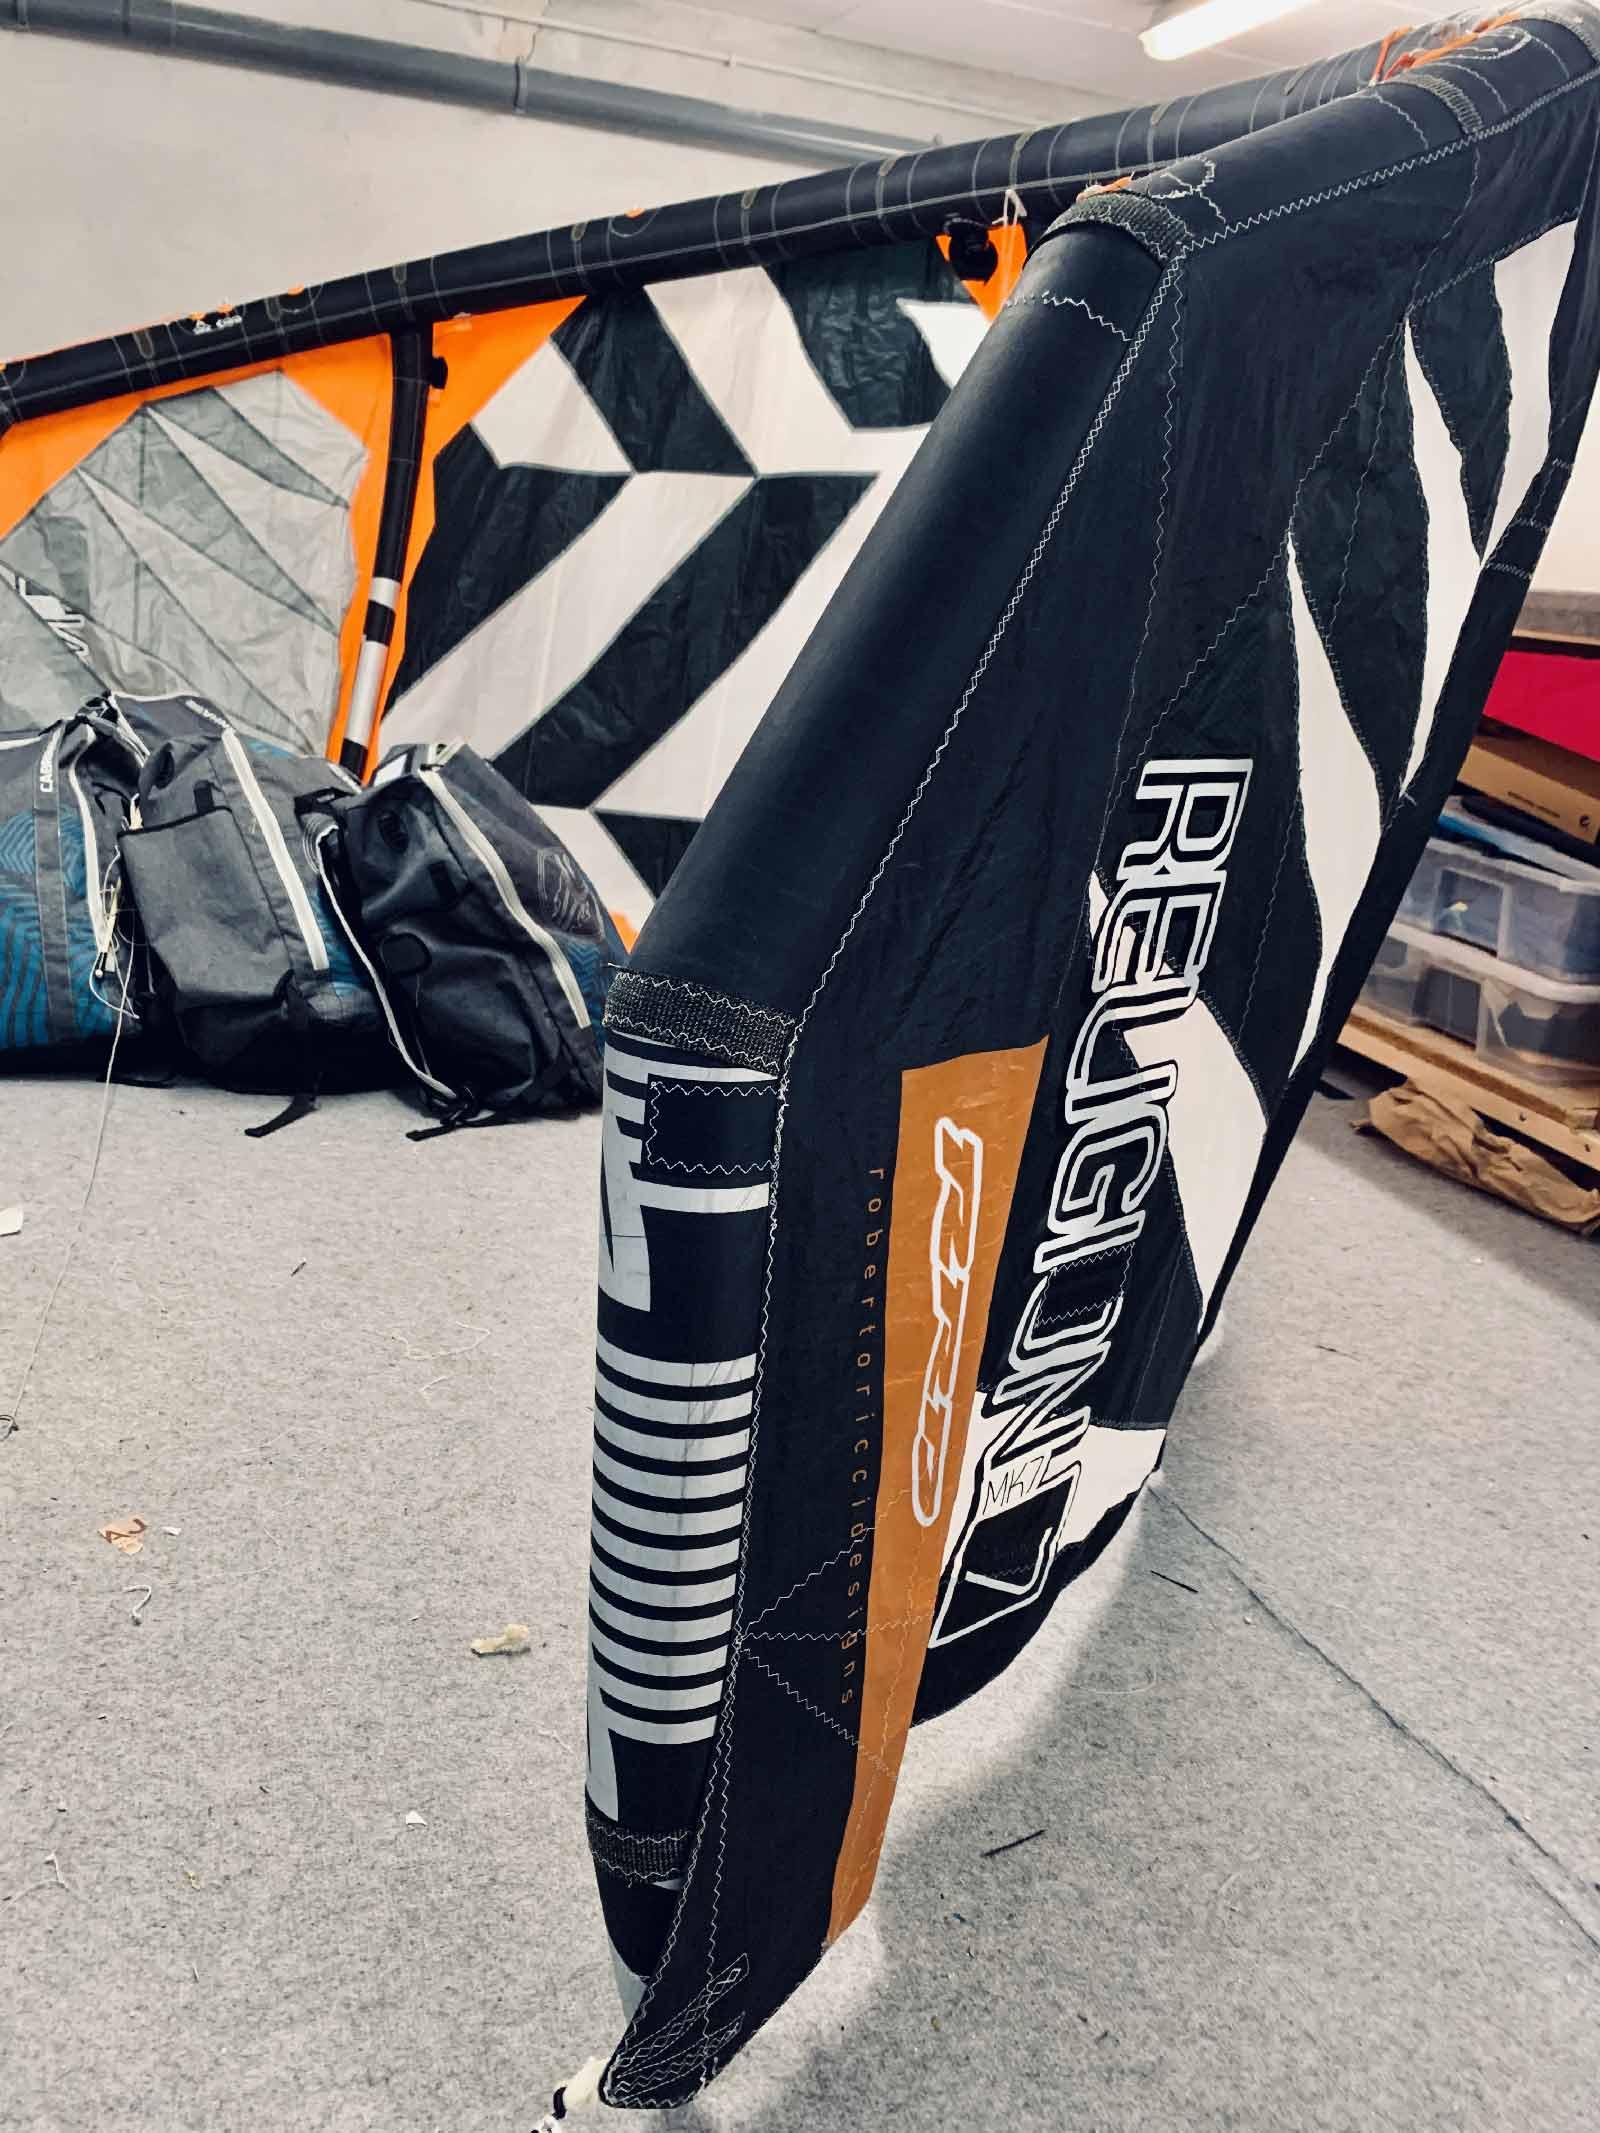 reparation-kite-rrd-kitesurfix-3